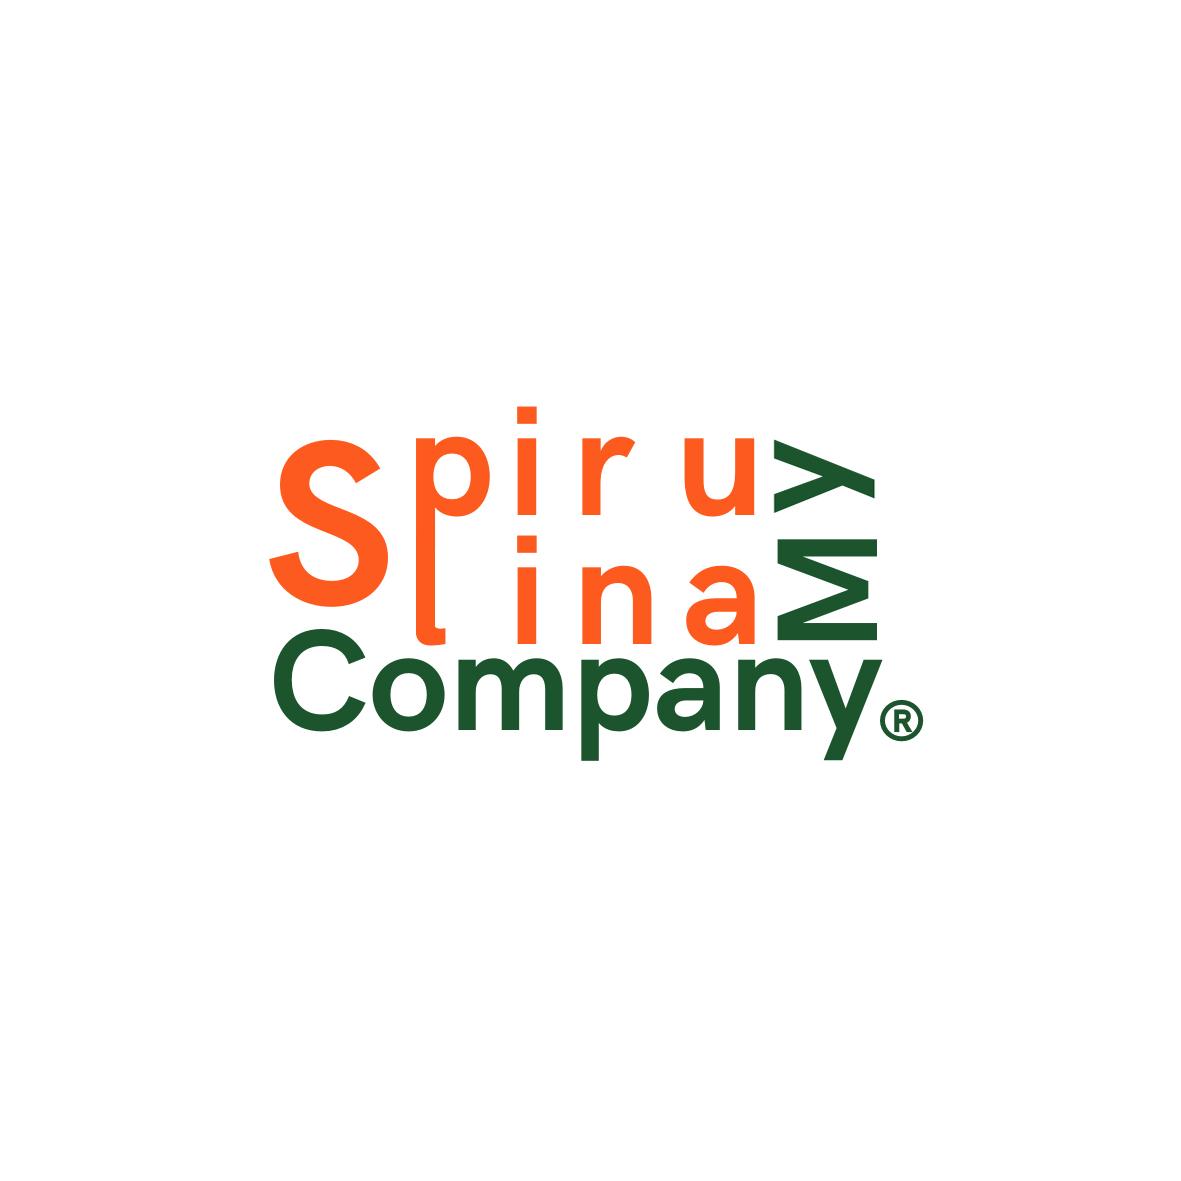 MY SPIRULINA COMPANY